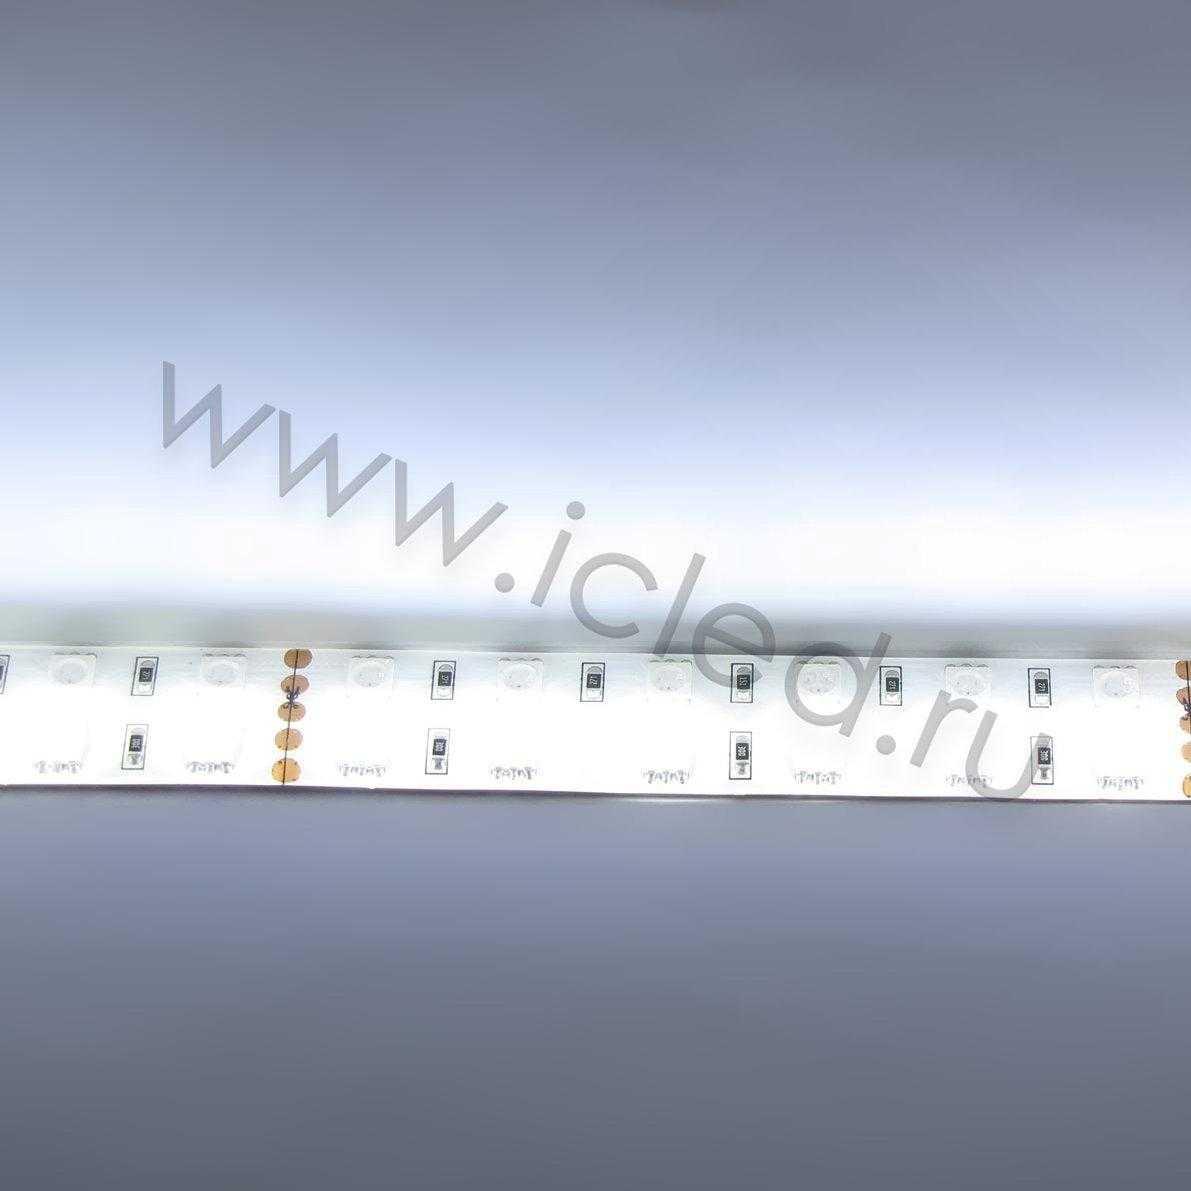 СветодиСветодиодная лента Class B, 5050, 120 led/m, RGBW, 24V, IP65одная лента Class B, 5050, 120 led/m, RGBW, 24V, IP65